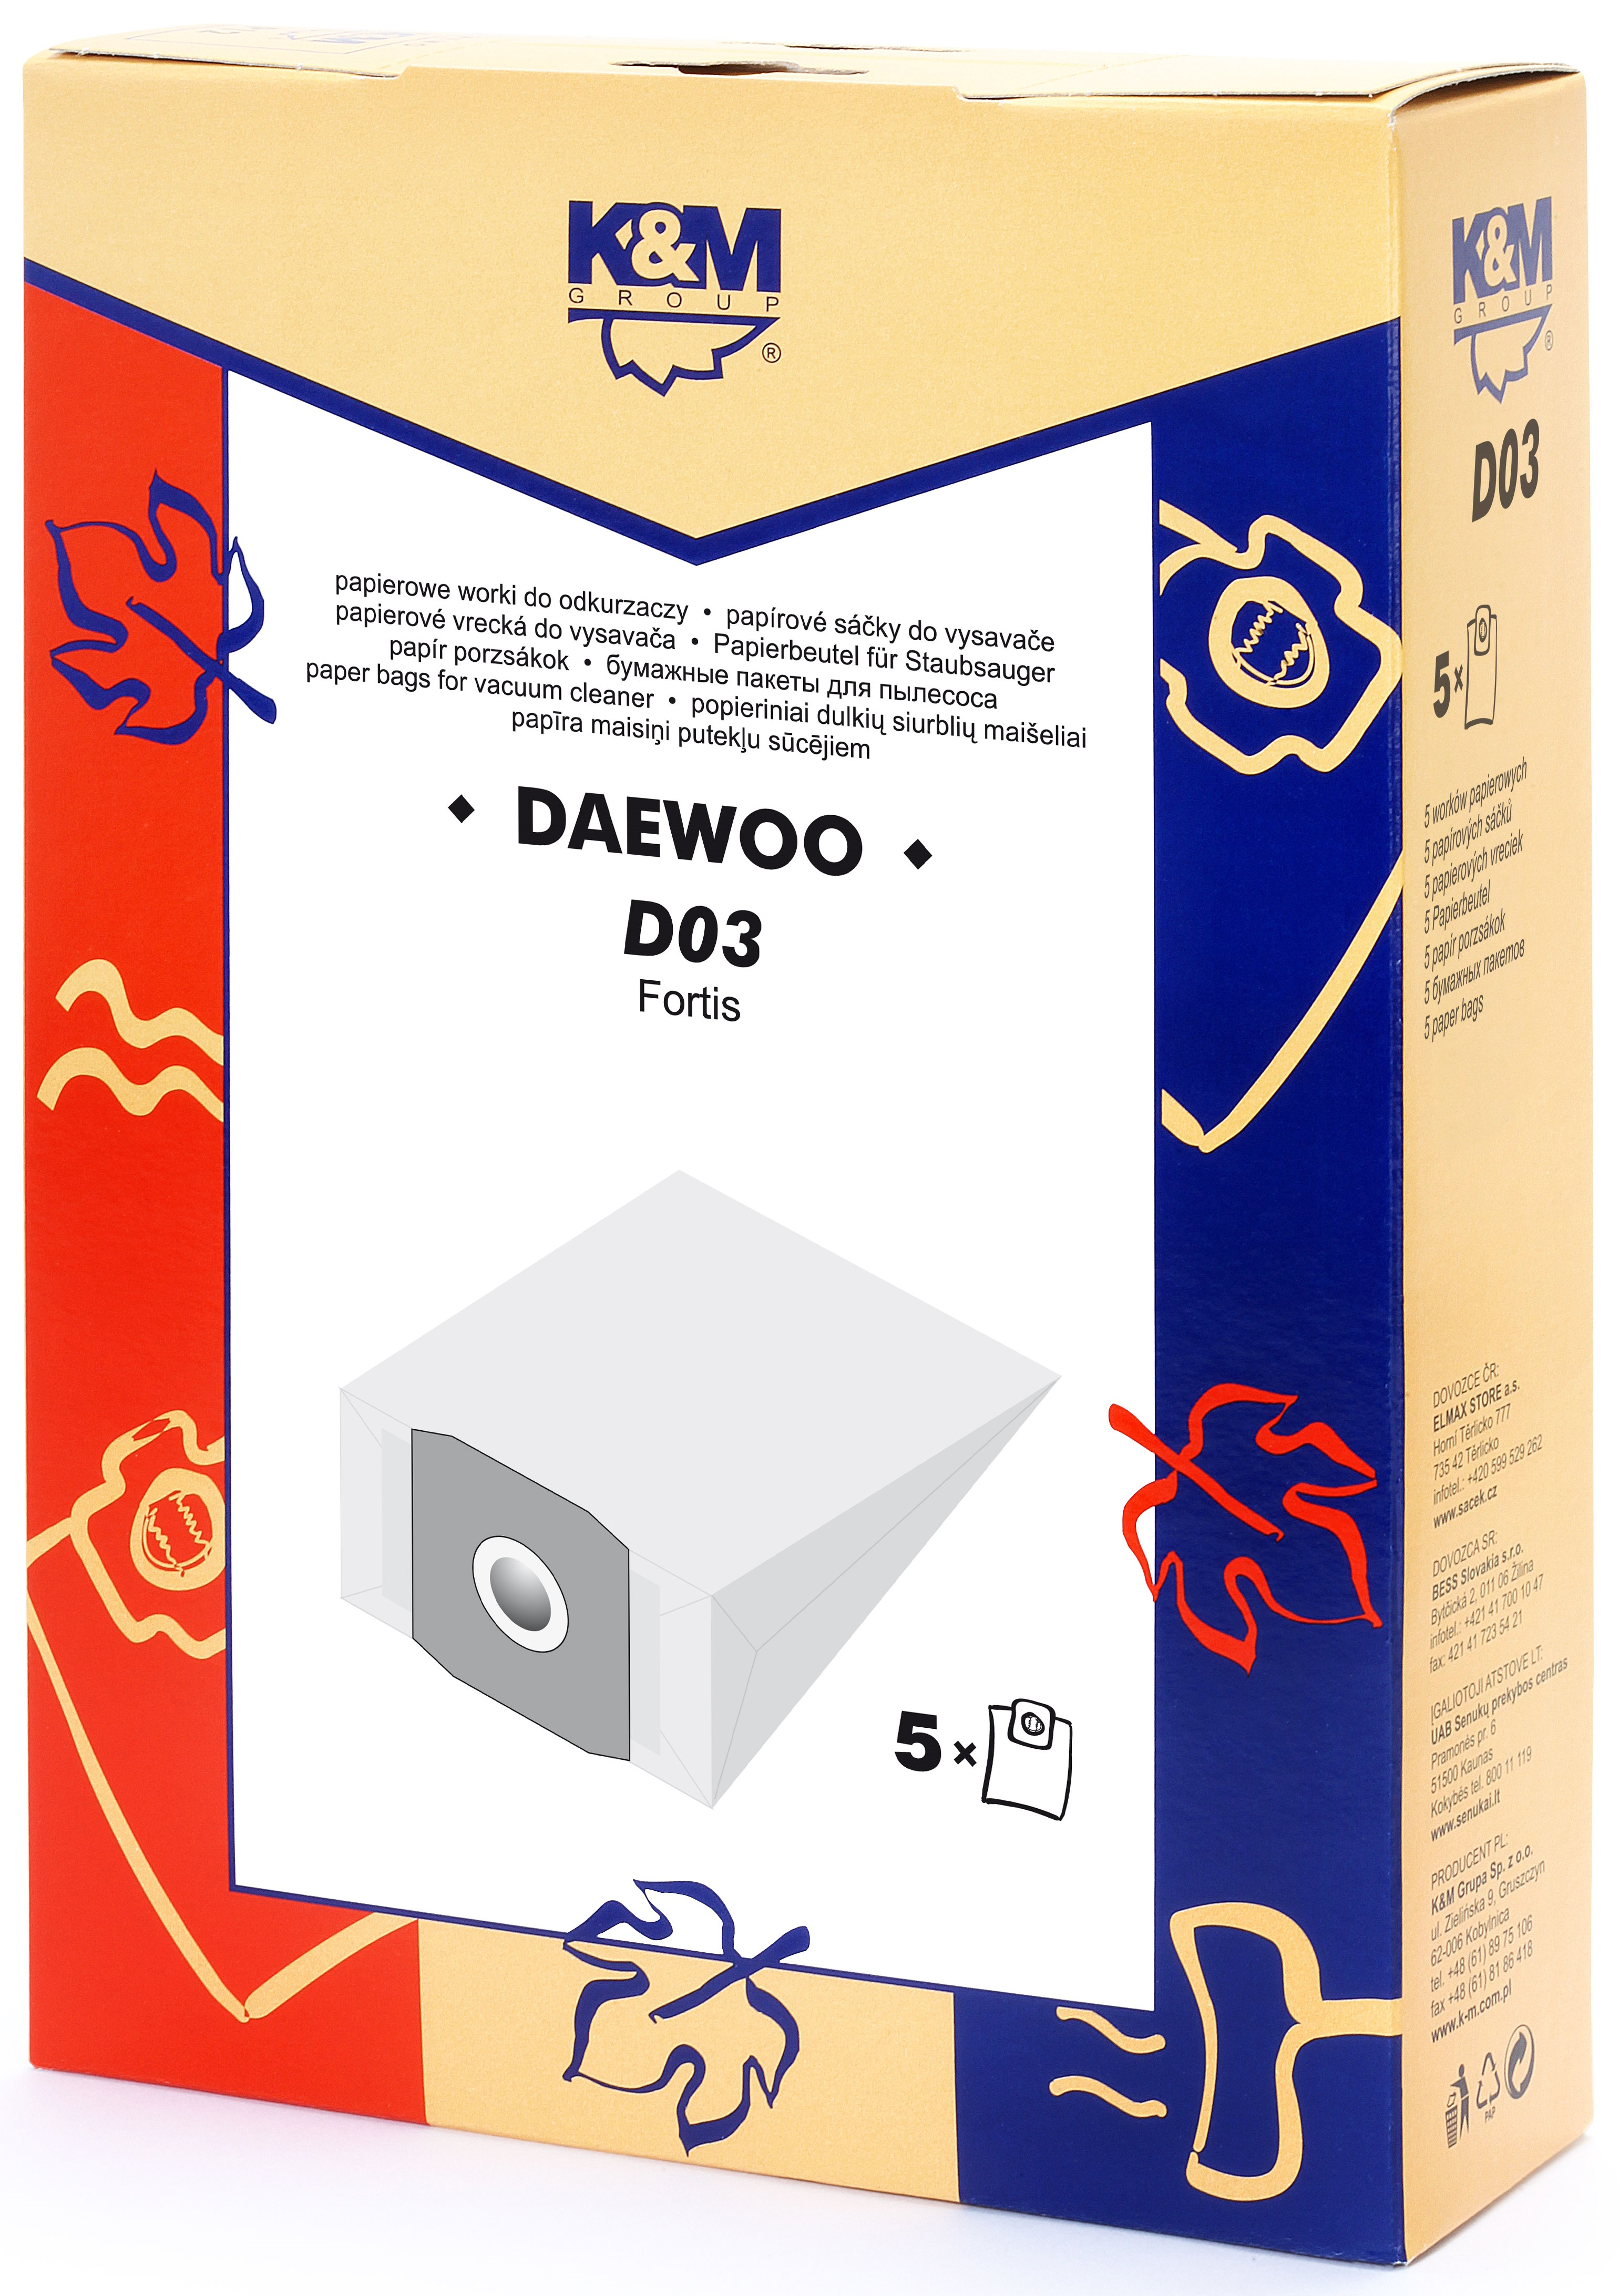 Sac aspirator Daewoo RC300, hartie, 5X saci, K&M 0